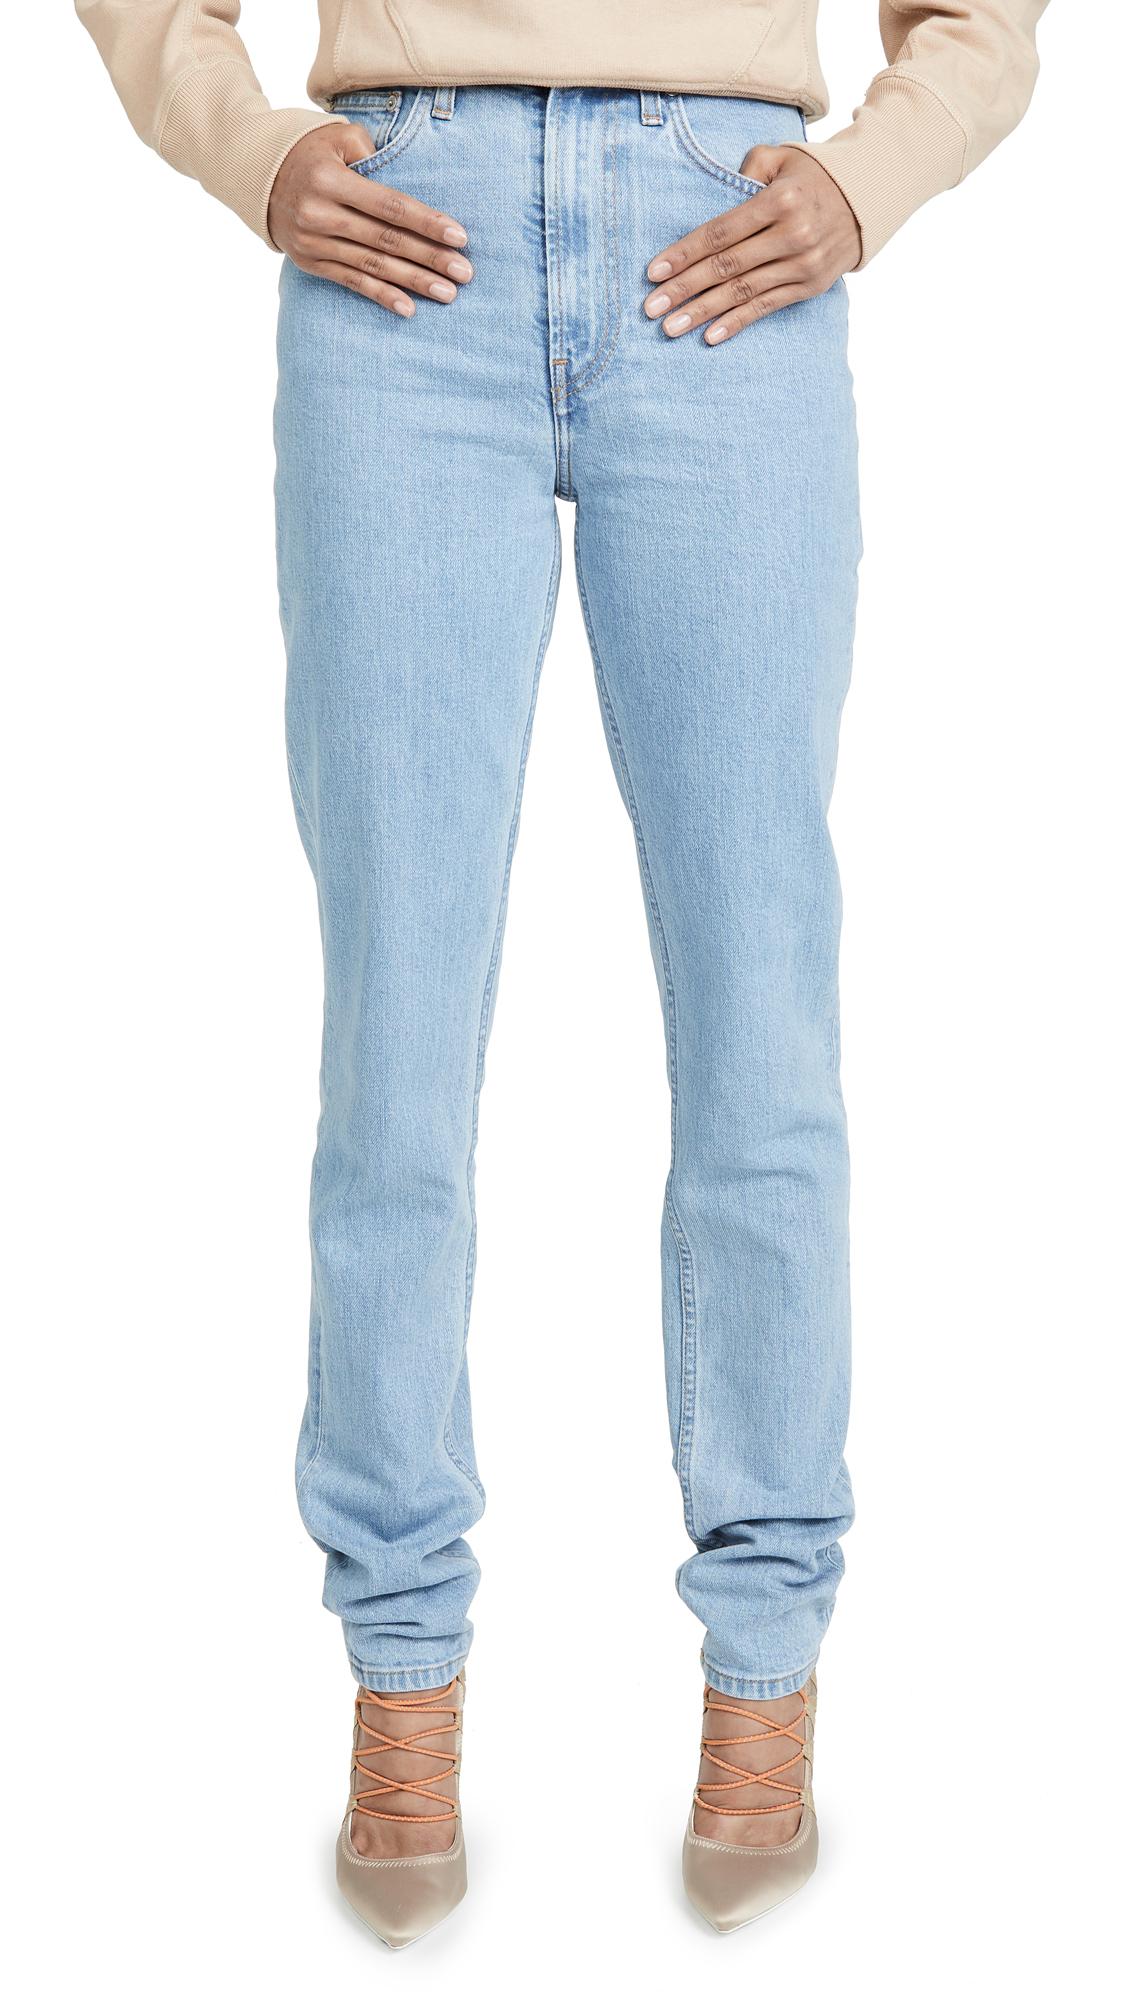 Helmut Lang Femme High Spikes Jeans - Light Stone Indigo